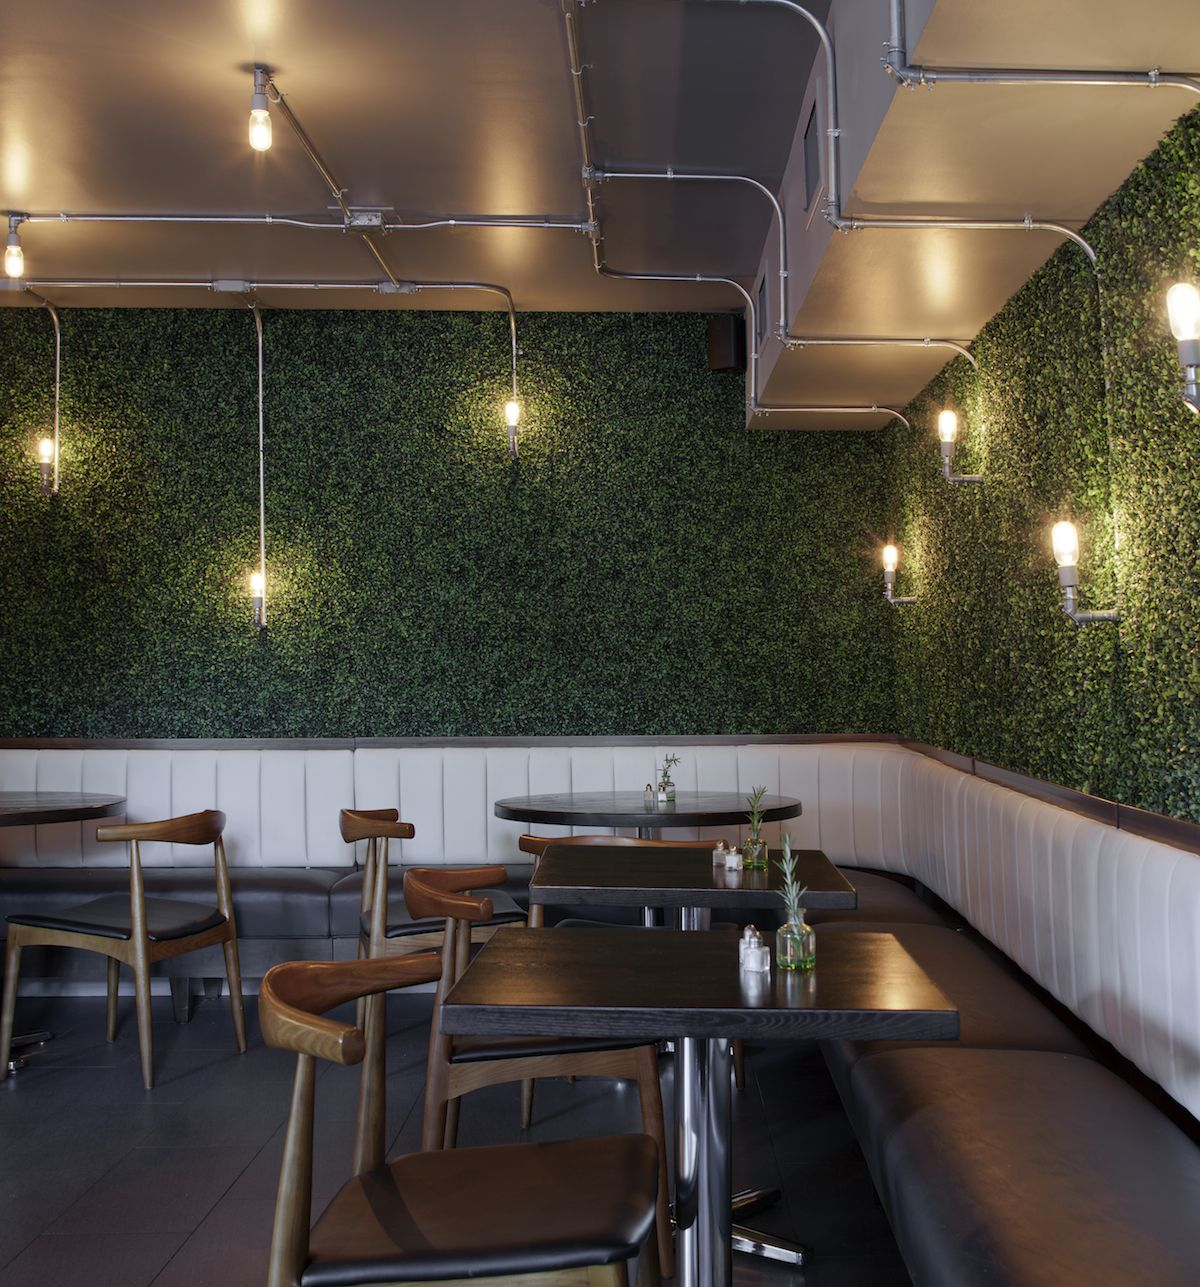 Banquette Restaurant: Restaurant Restoration Banquette Seating- Sam Carroll